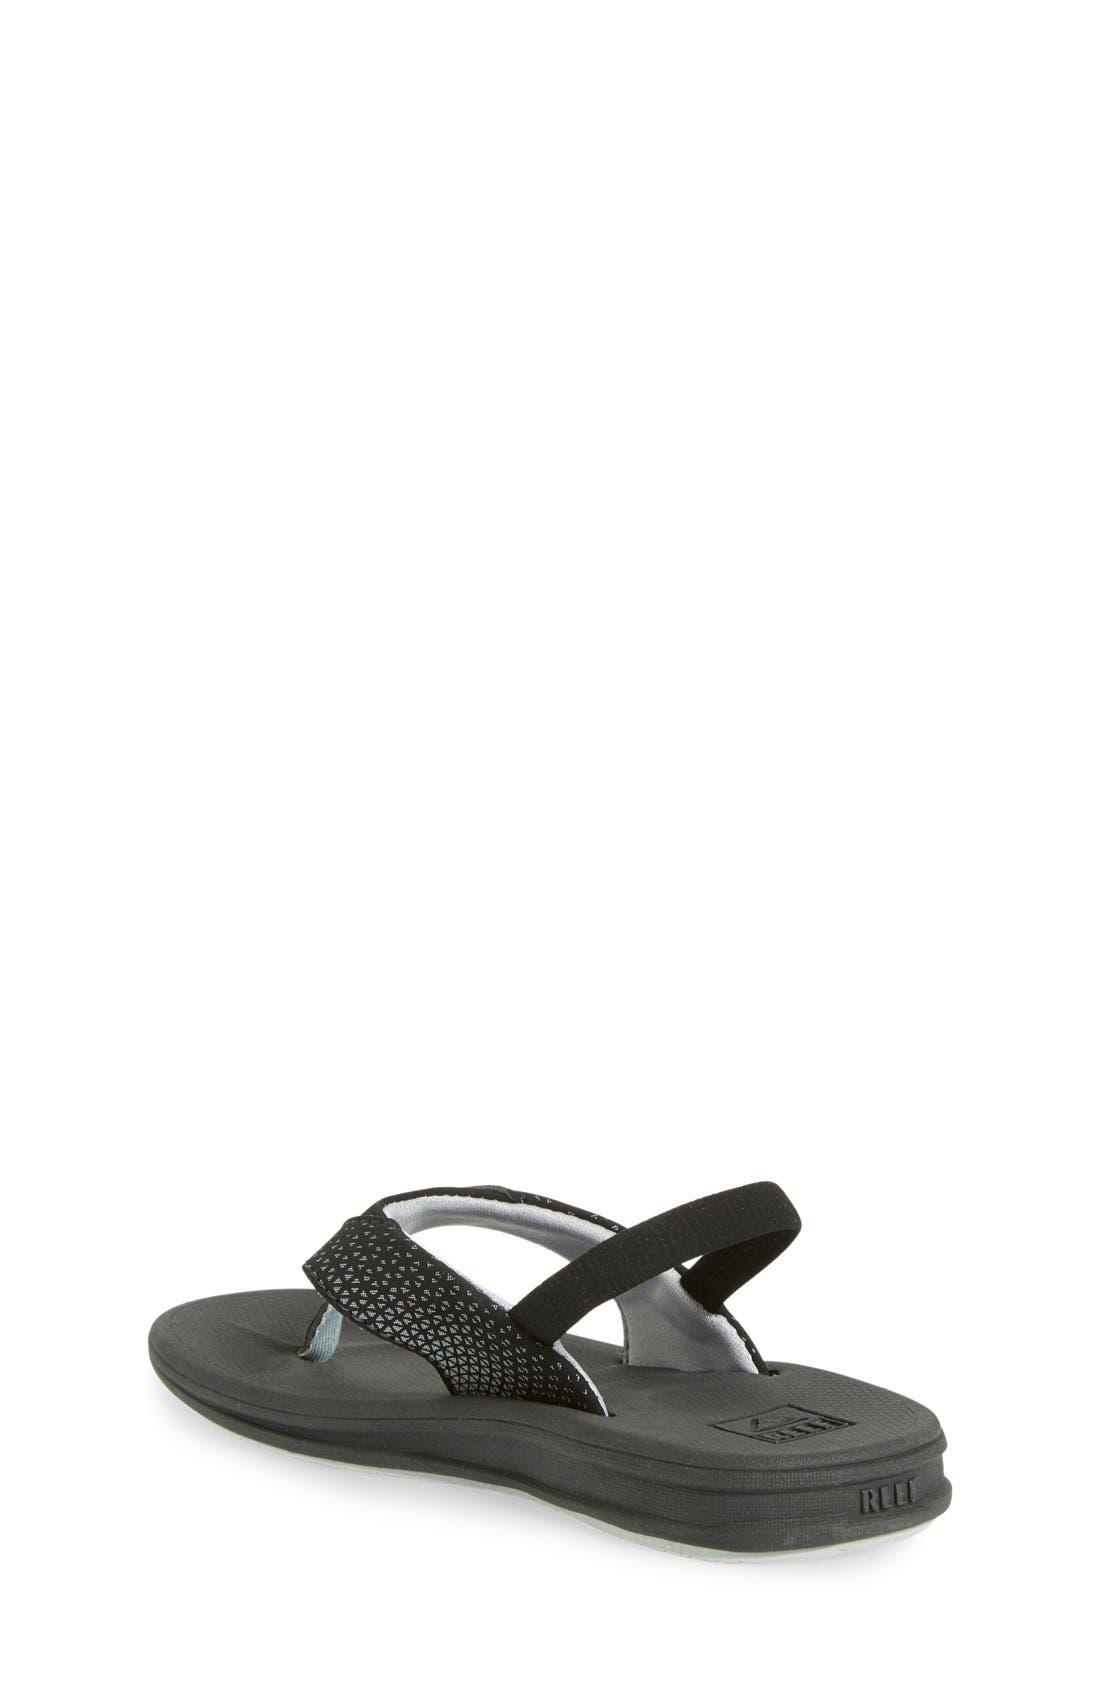 'Grom Rover' Water Friendly Sandal,                             Alternate thumbnail 2, color,                             Black